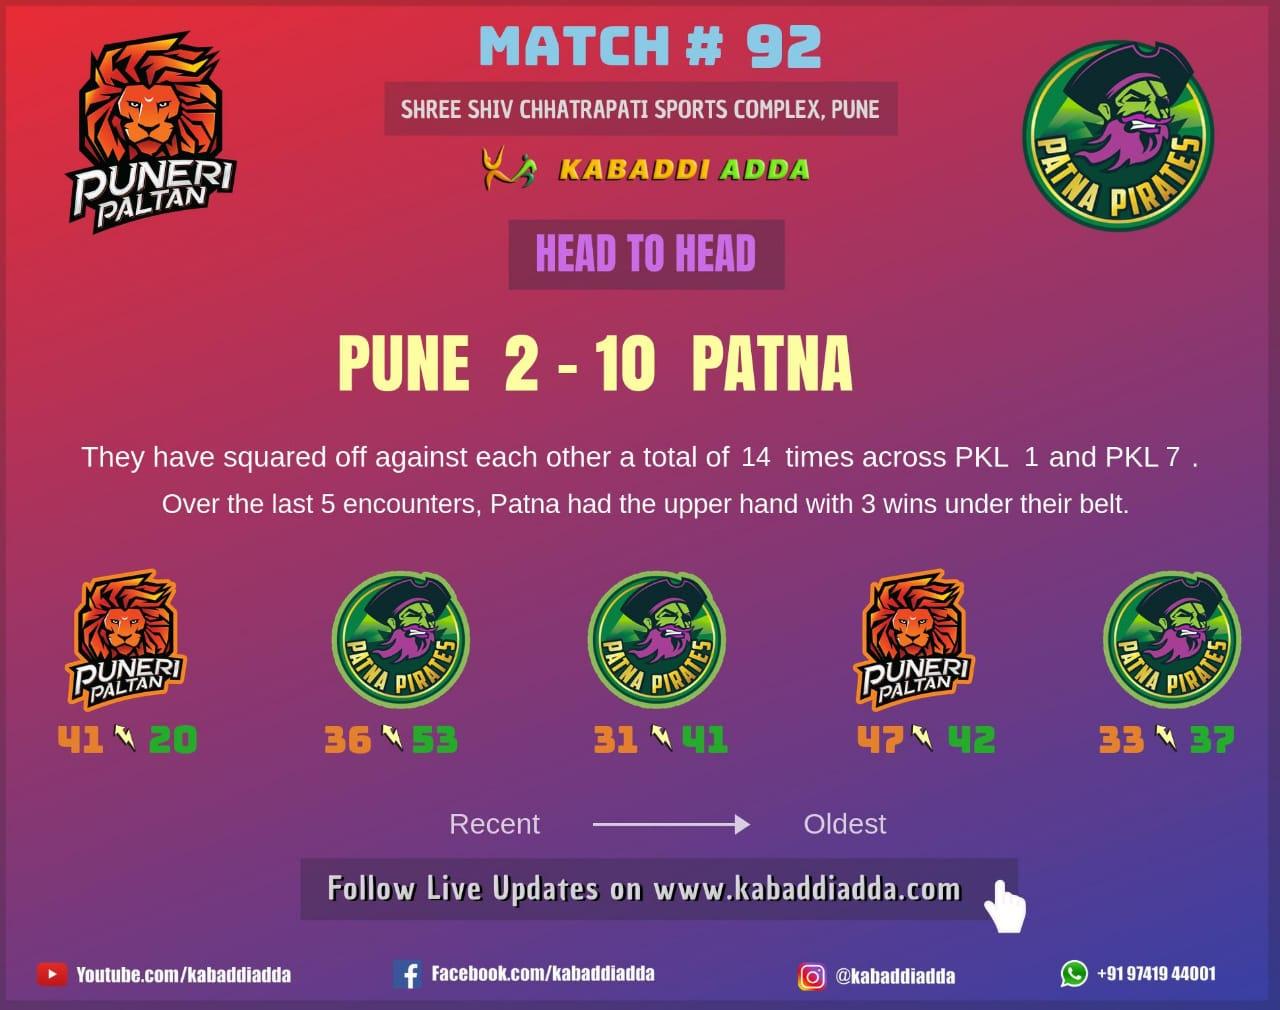 Pune and Patna